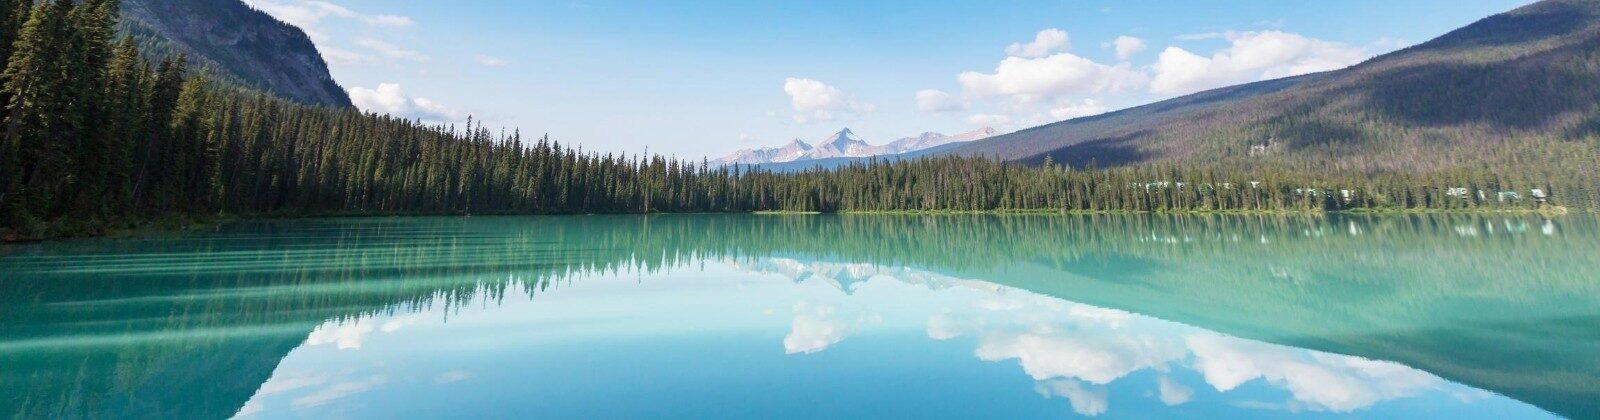 canada west coast lake